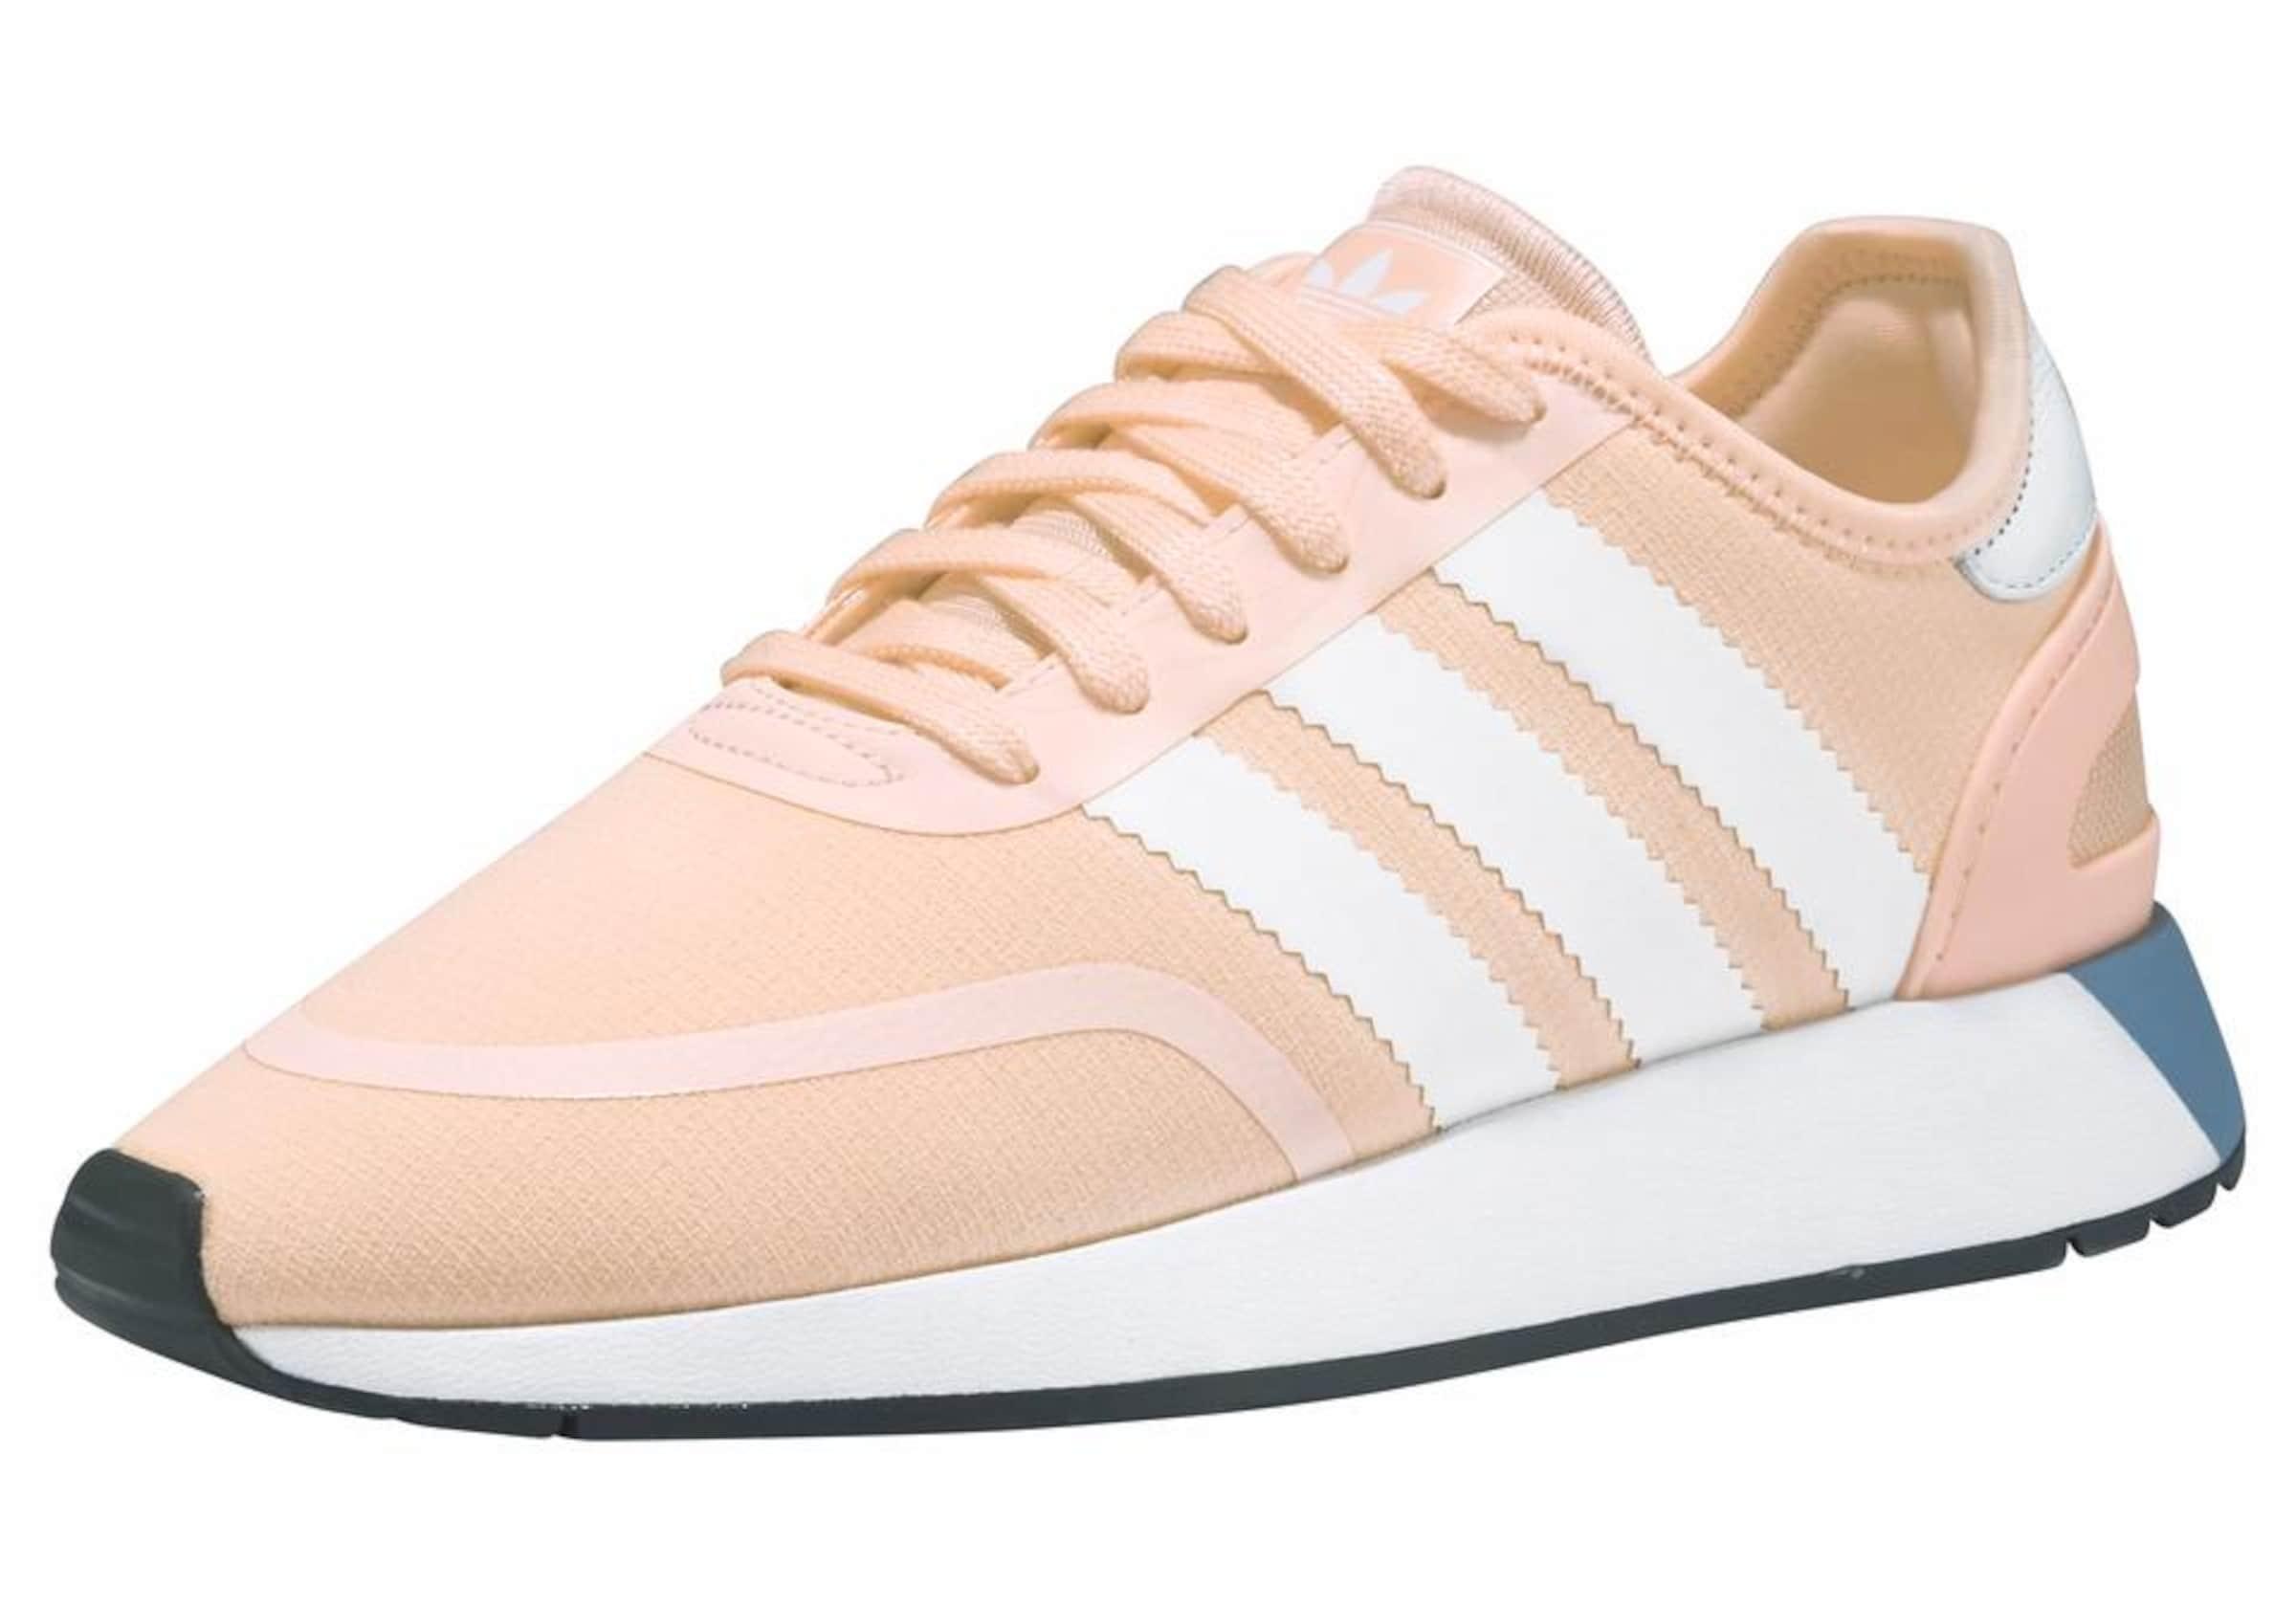 ADIDAS ORIGINALS Sneaker im Retro-Look Hohe Qualität